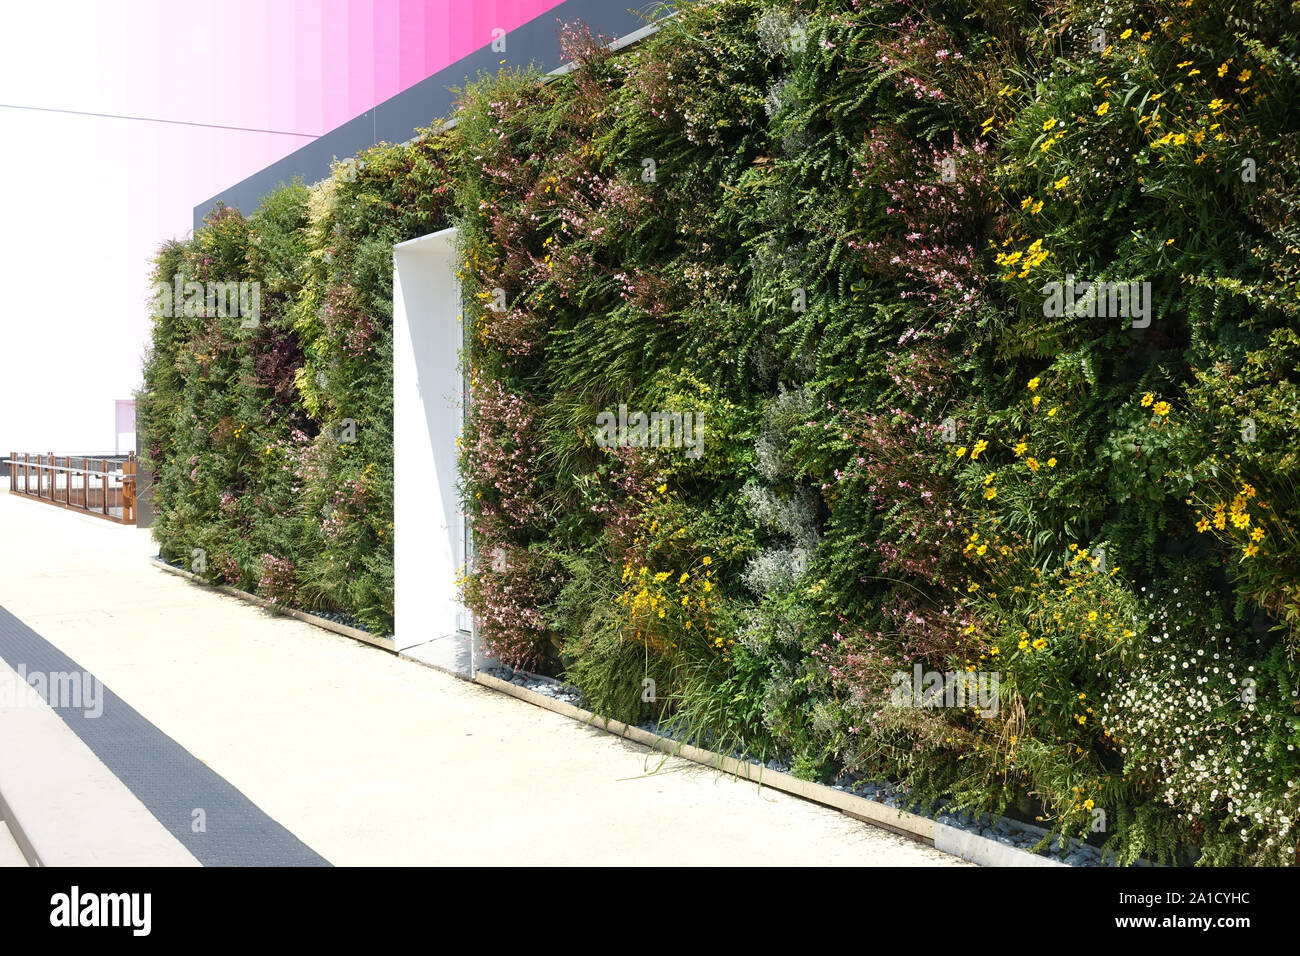 Mailand, Weltausstellung 2015, Future Food Court - Milano, la Expo 2015, Futuro Food Court. Foto de stock